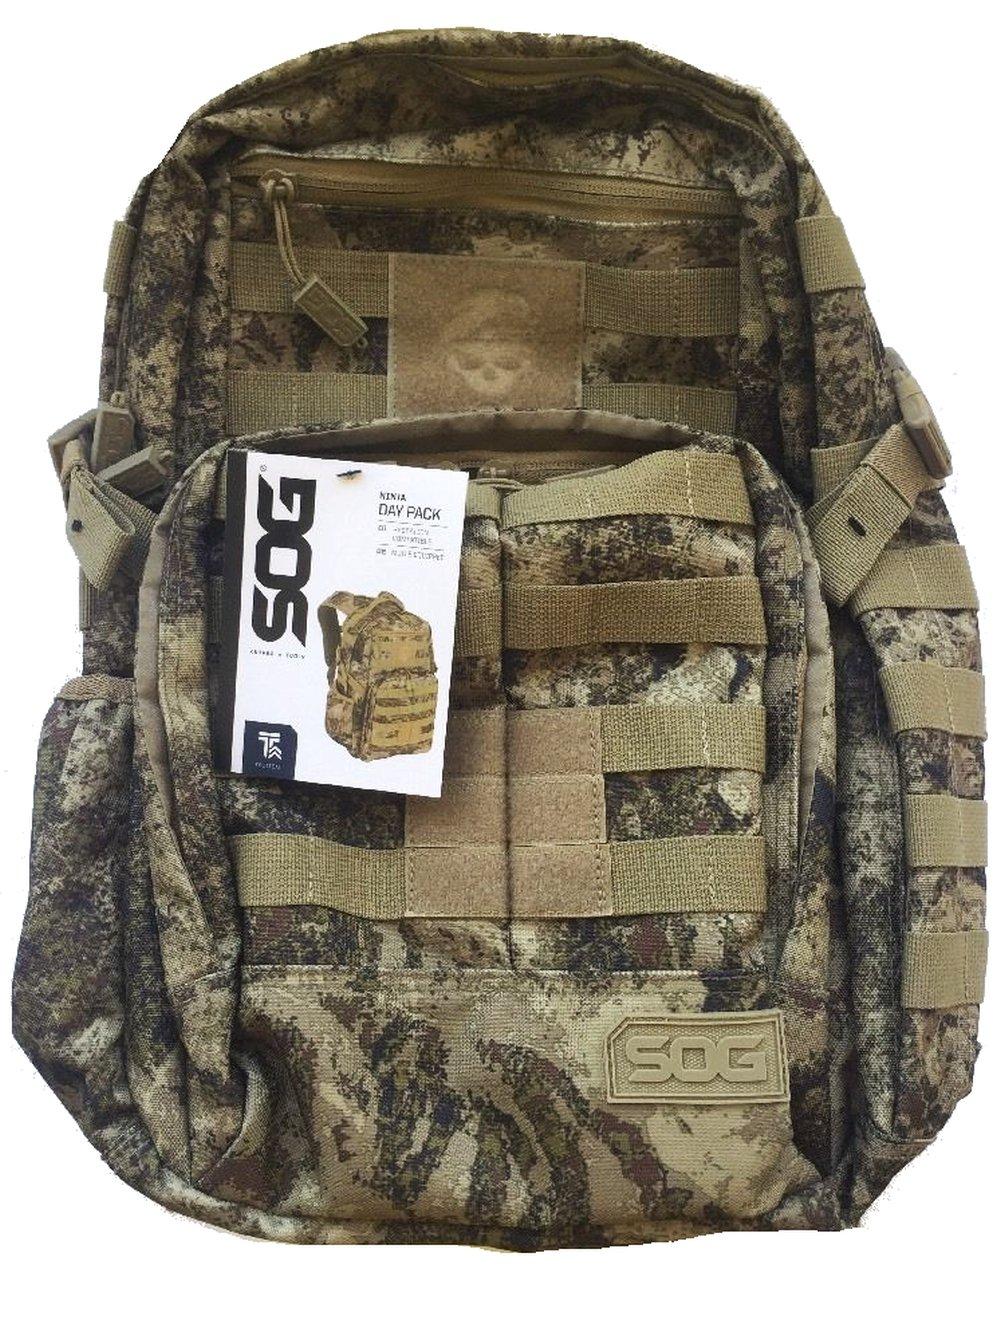 SOG Ninja Tactical Daypack Backpack Desert Camo Molle by SOG (Image #1)